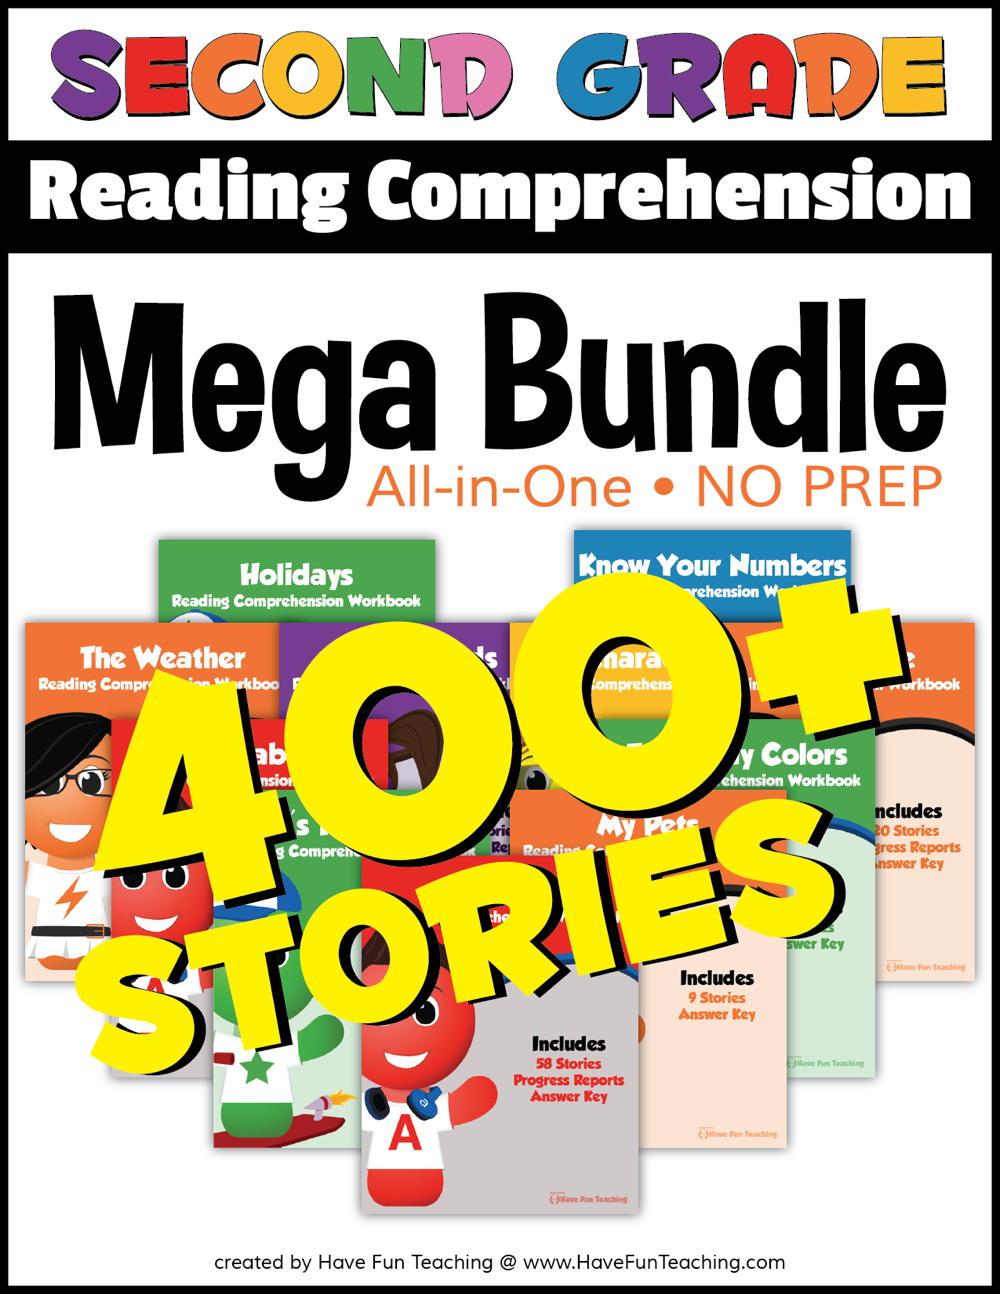 Second Grade Reading Comprehension - No Prep All In One Mega Bundle